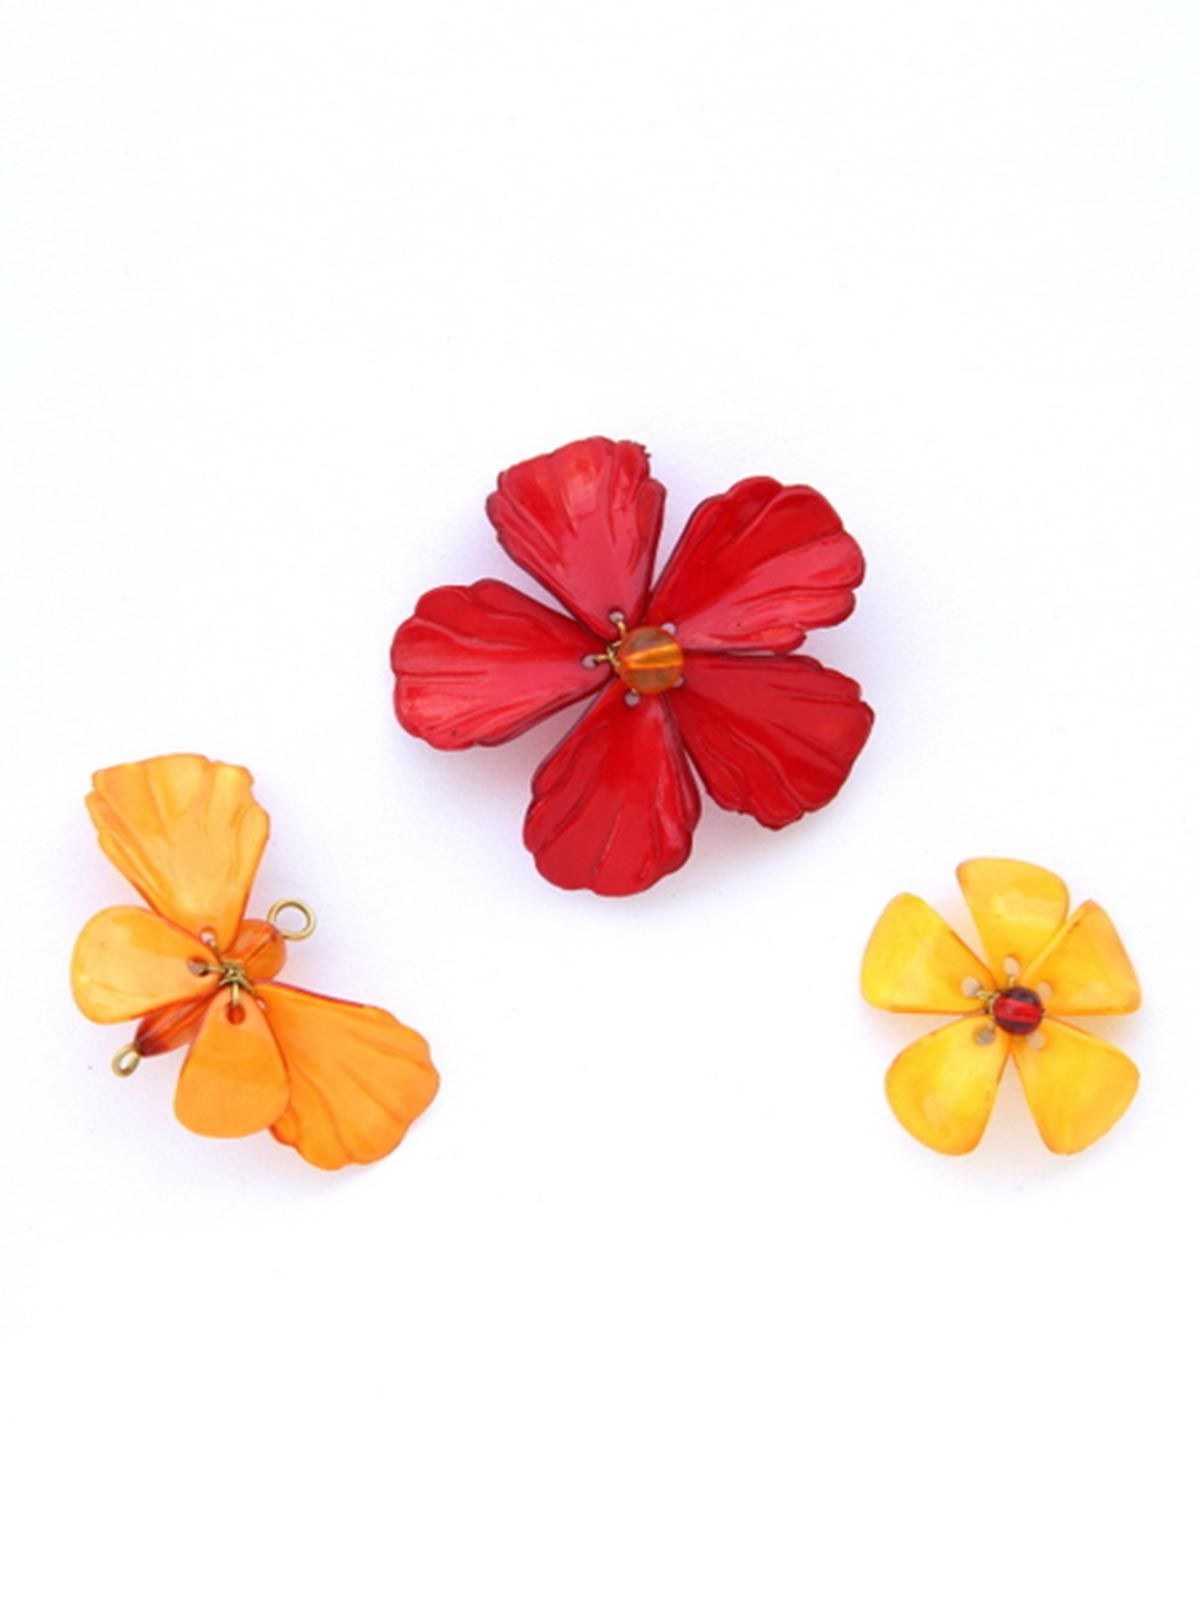 Kanhai Spring Sunny Quirky Fridge Magnets